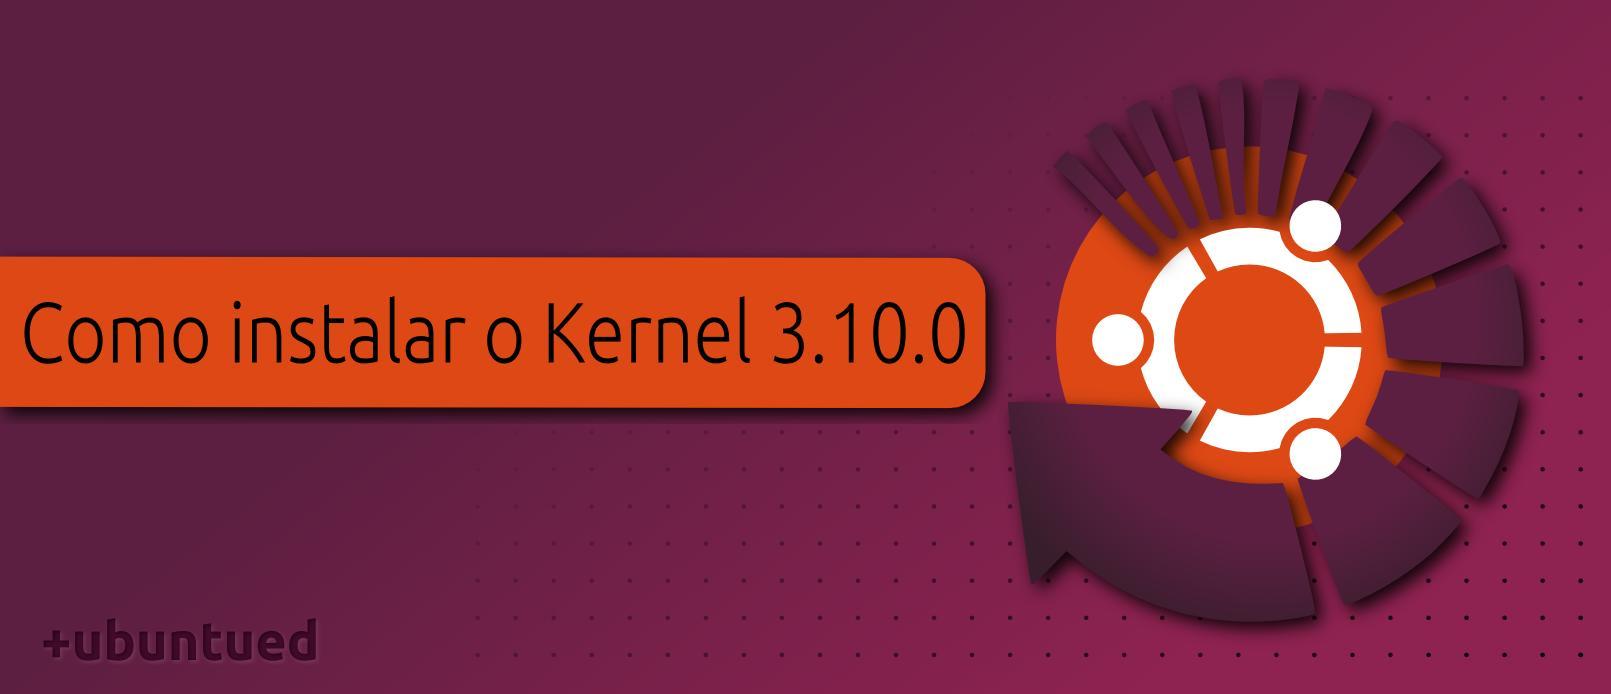 Como instalar o novo Kernel Linux 3.10.0 no Ubuntu 13.04/12.10